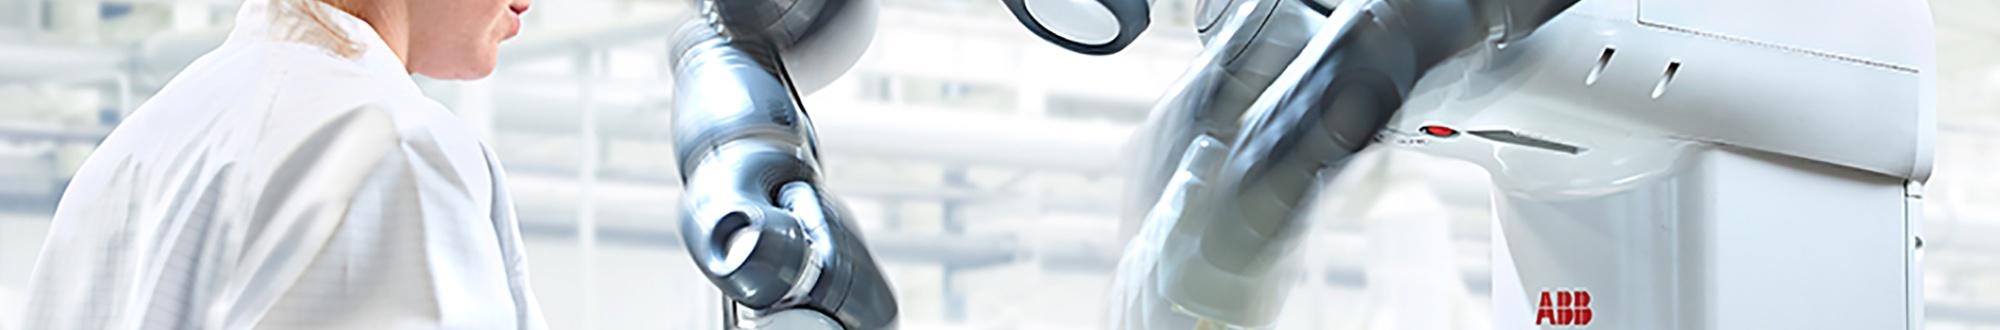 ABB - Industrieroboter-YuMi®– IRB 14000